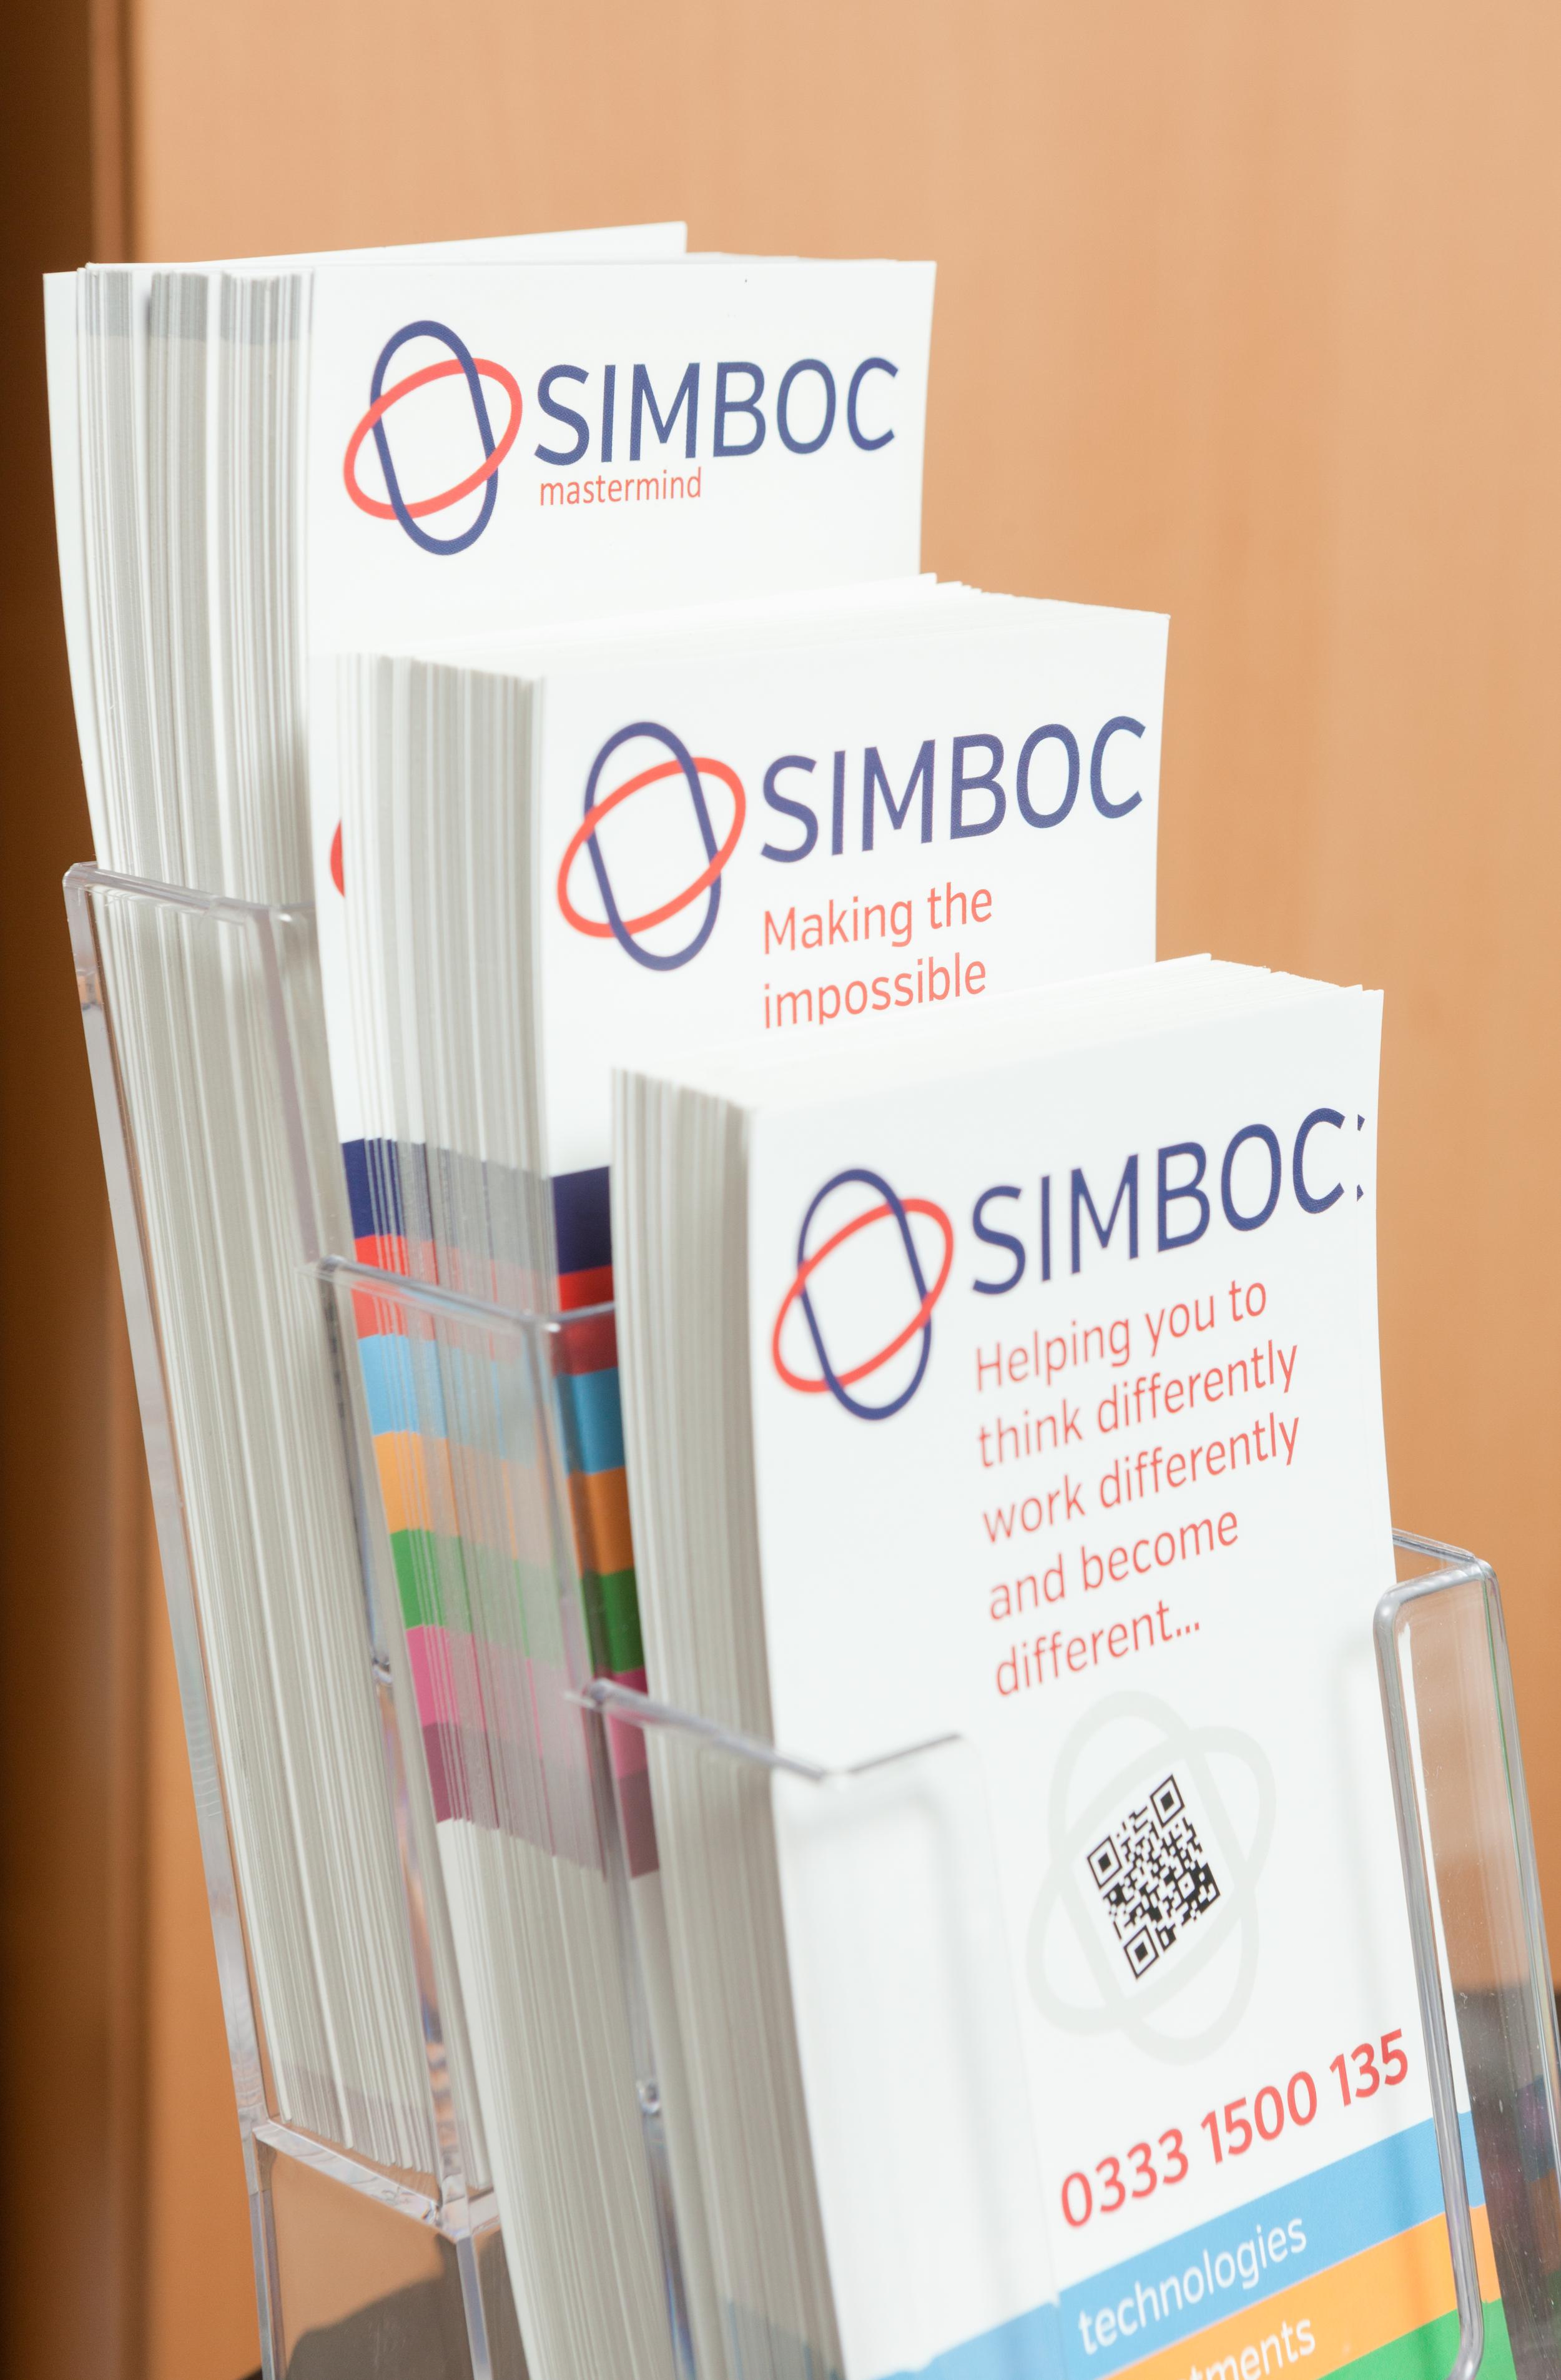 Simboc Leaflets_SimbocLtd_6570.jpg